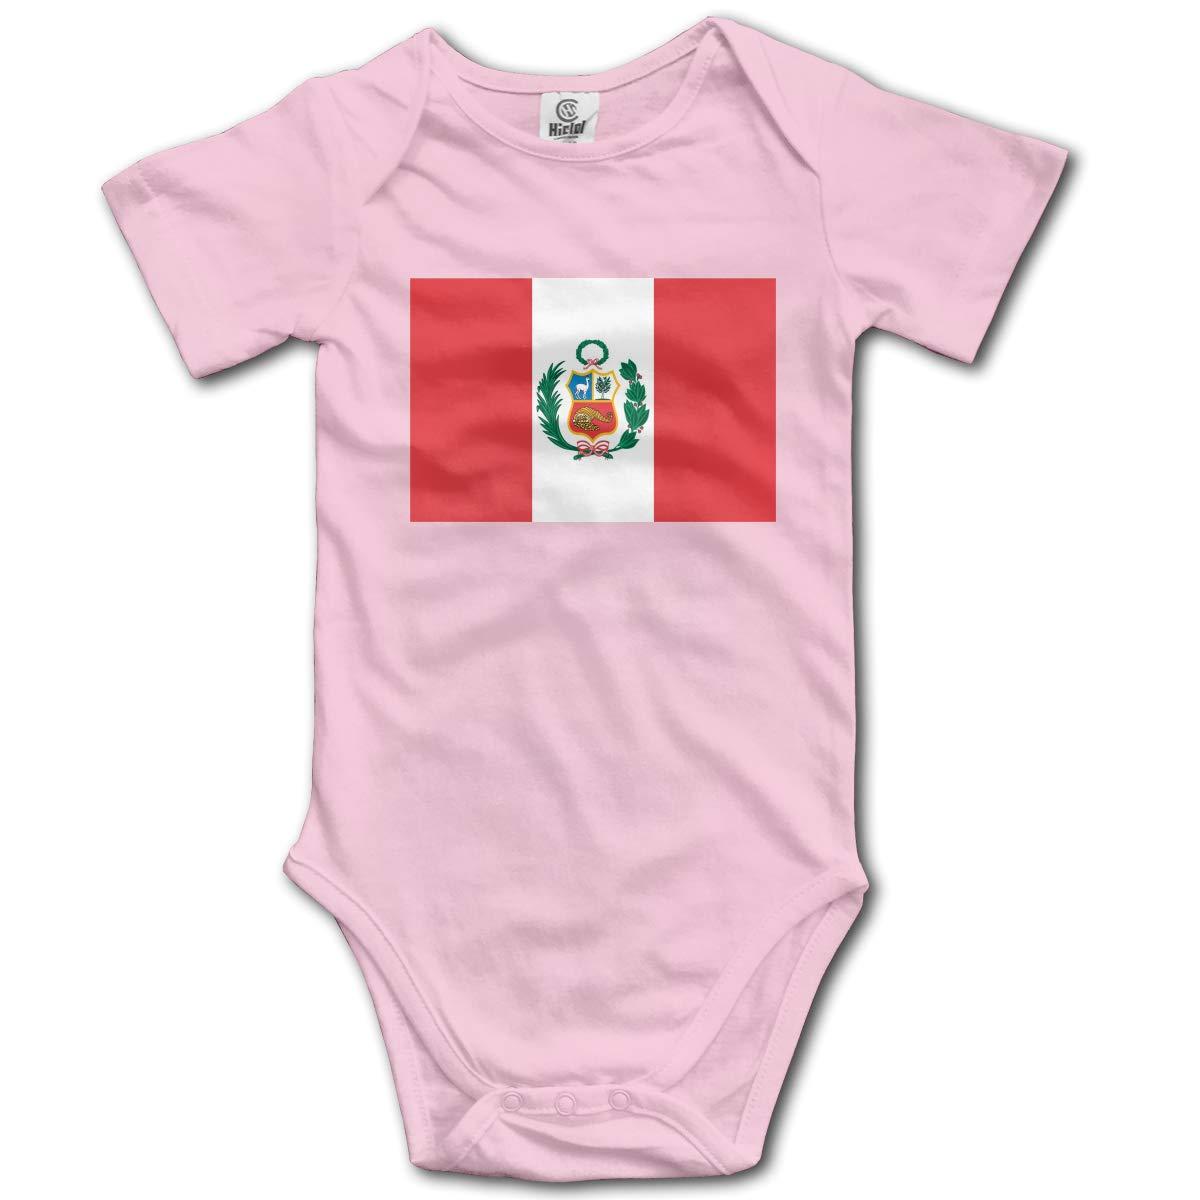 CUTEDWARF Baby Short-Sleeve Onesies Peru Flag Bodysuit Baby Outfits